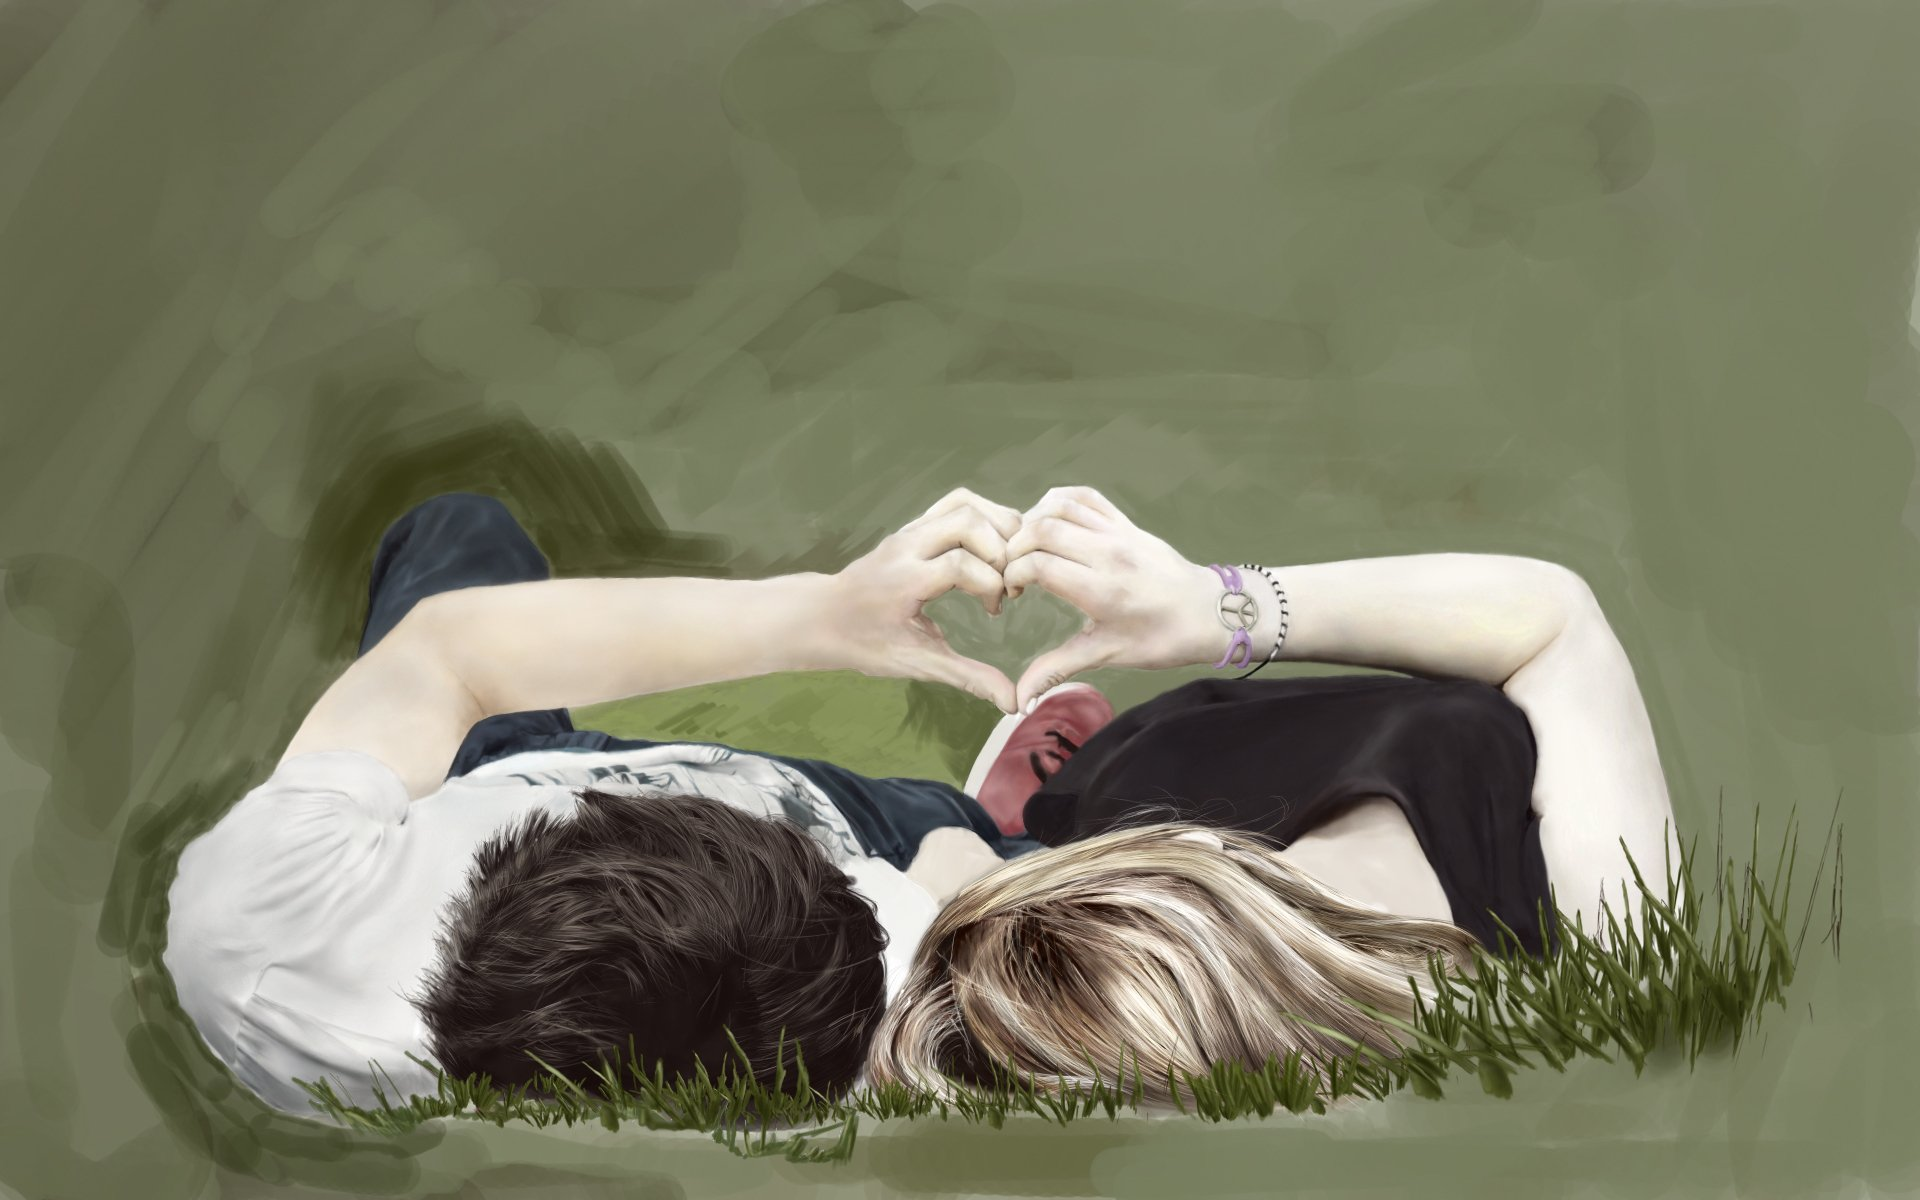 Beautiful Wallpaper Love Painting - e95a455125bd46dae1f579d1fe5b8319  Trends_934765.jpg